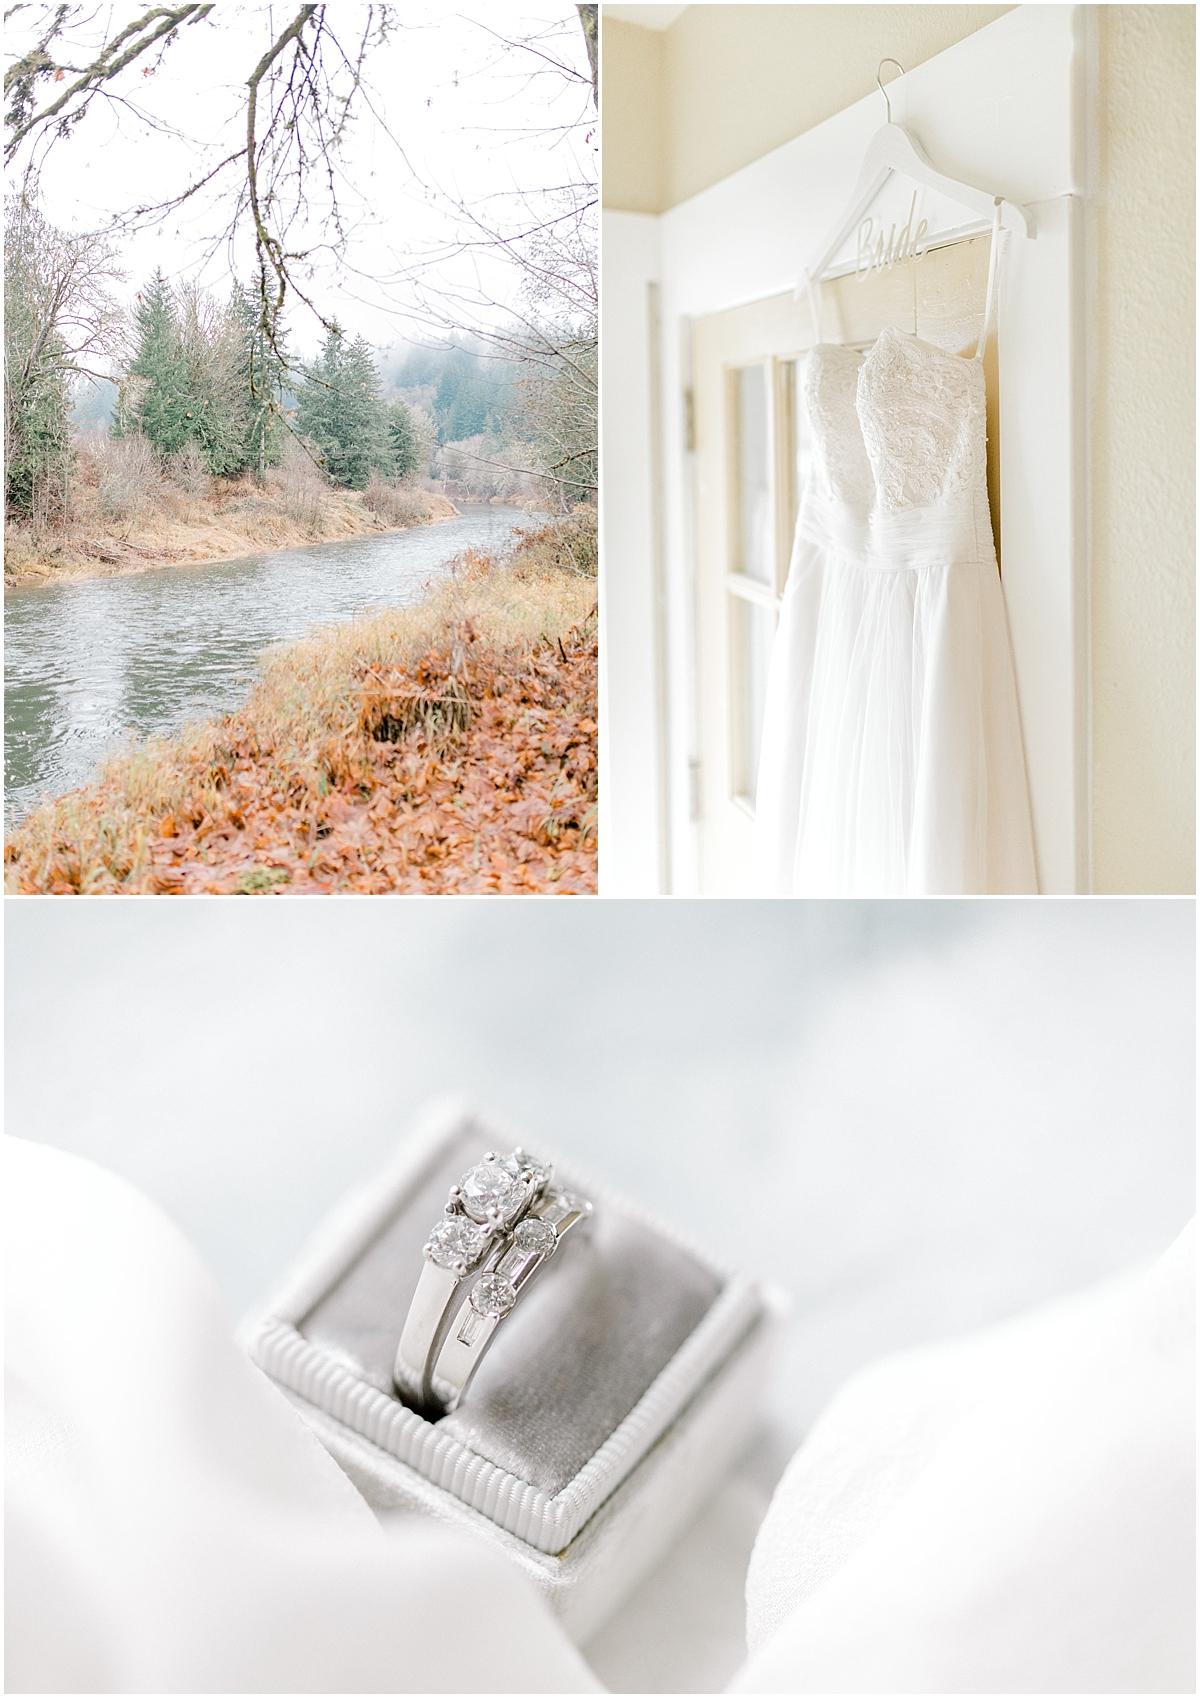 Chehalis Washington Winter Wedding Silver and White | Willapa Hills Farm Wedding | Eastham | Emma Rose Company PNW Light and Airy Wedding Photographer_0005.jpg